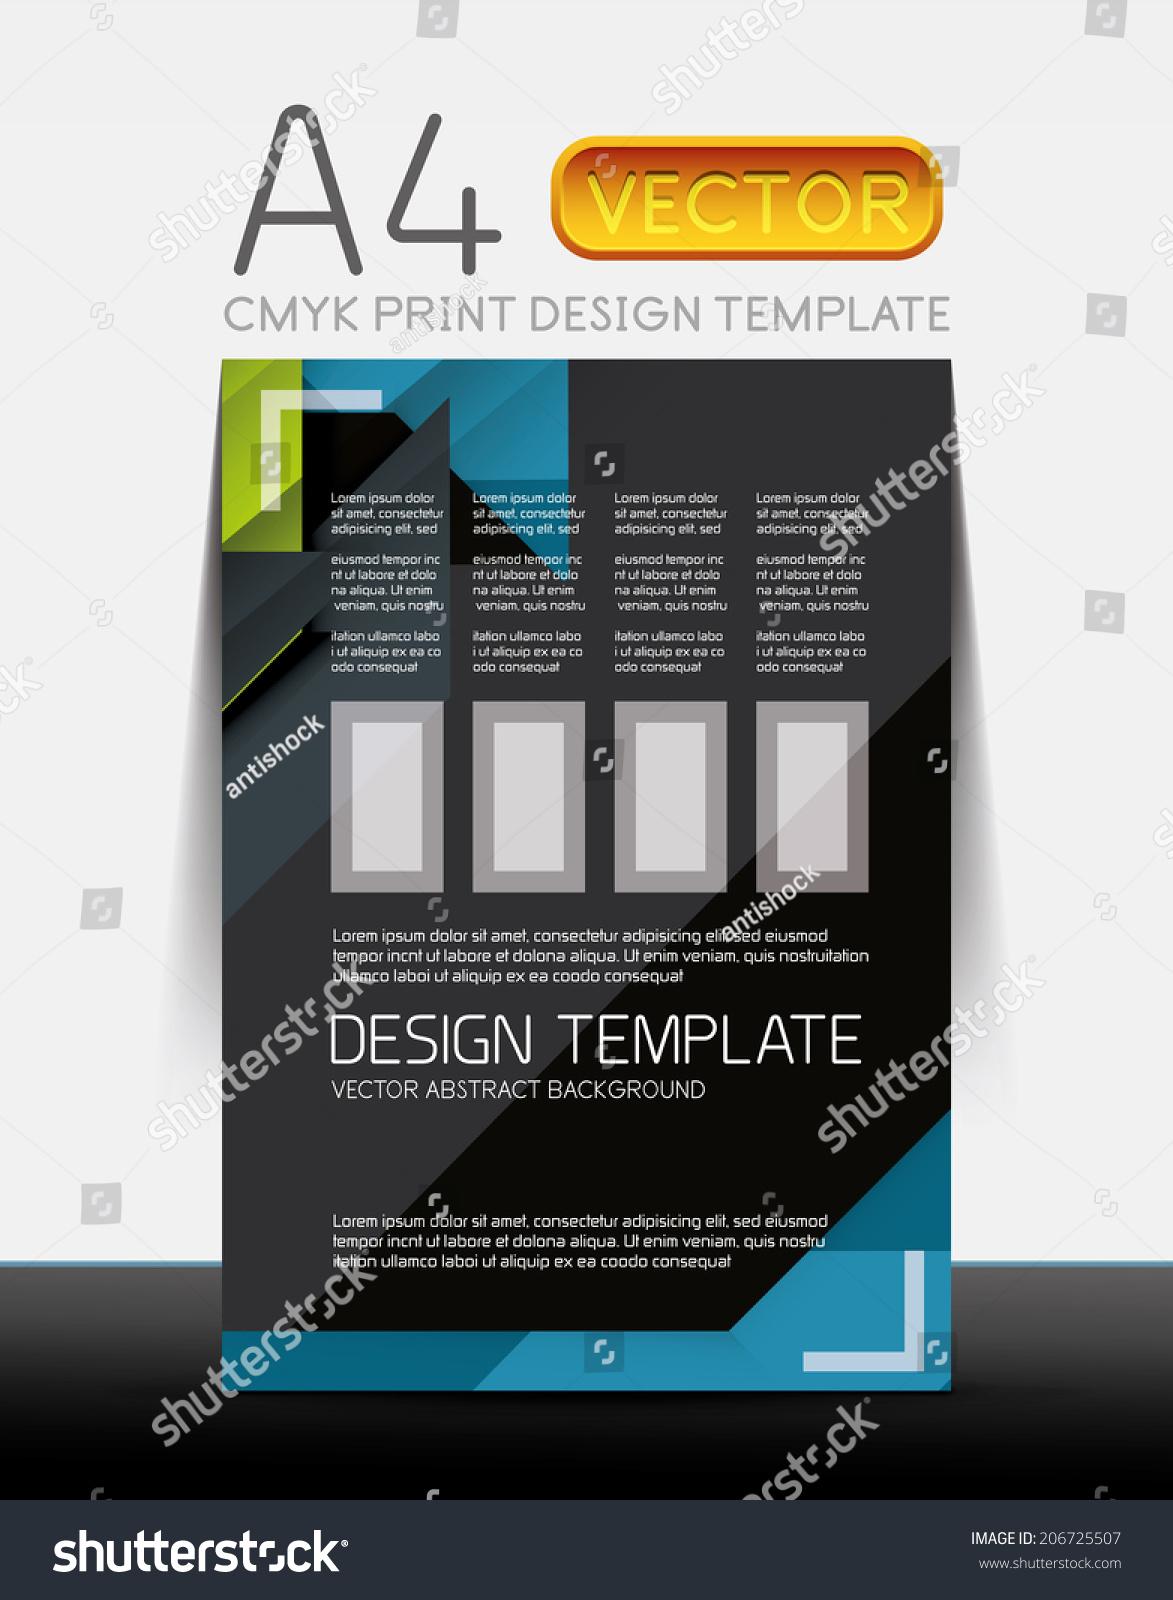 Sample El Brochure   Abstract Modern Flyer Brochure Vector Design Template With Sample